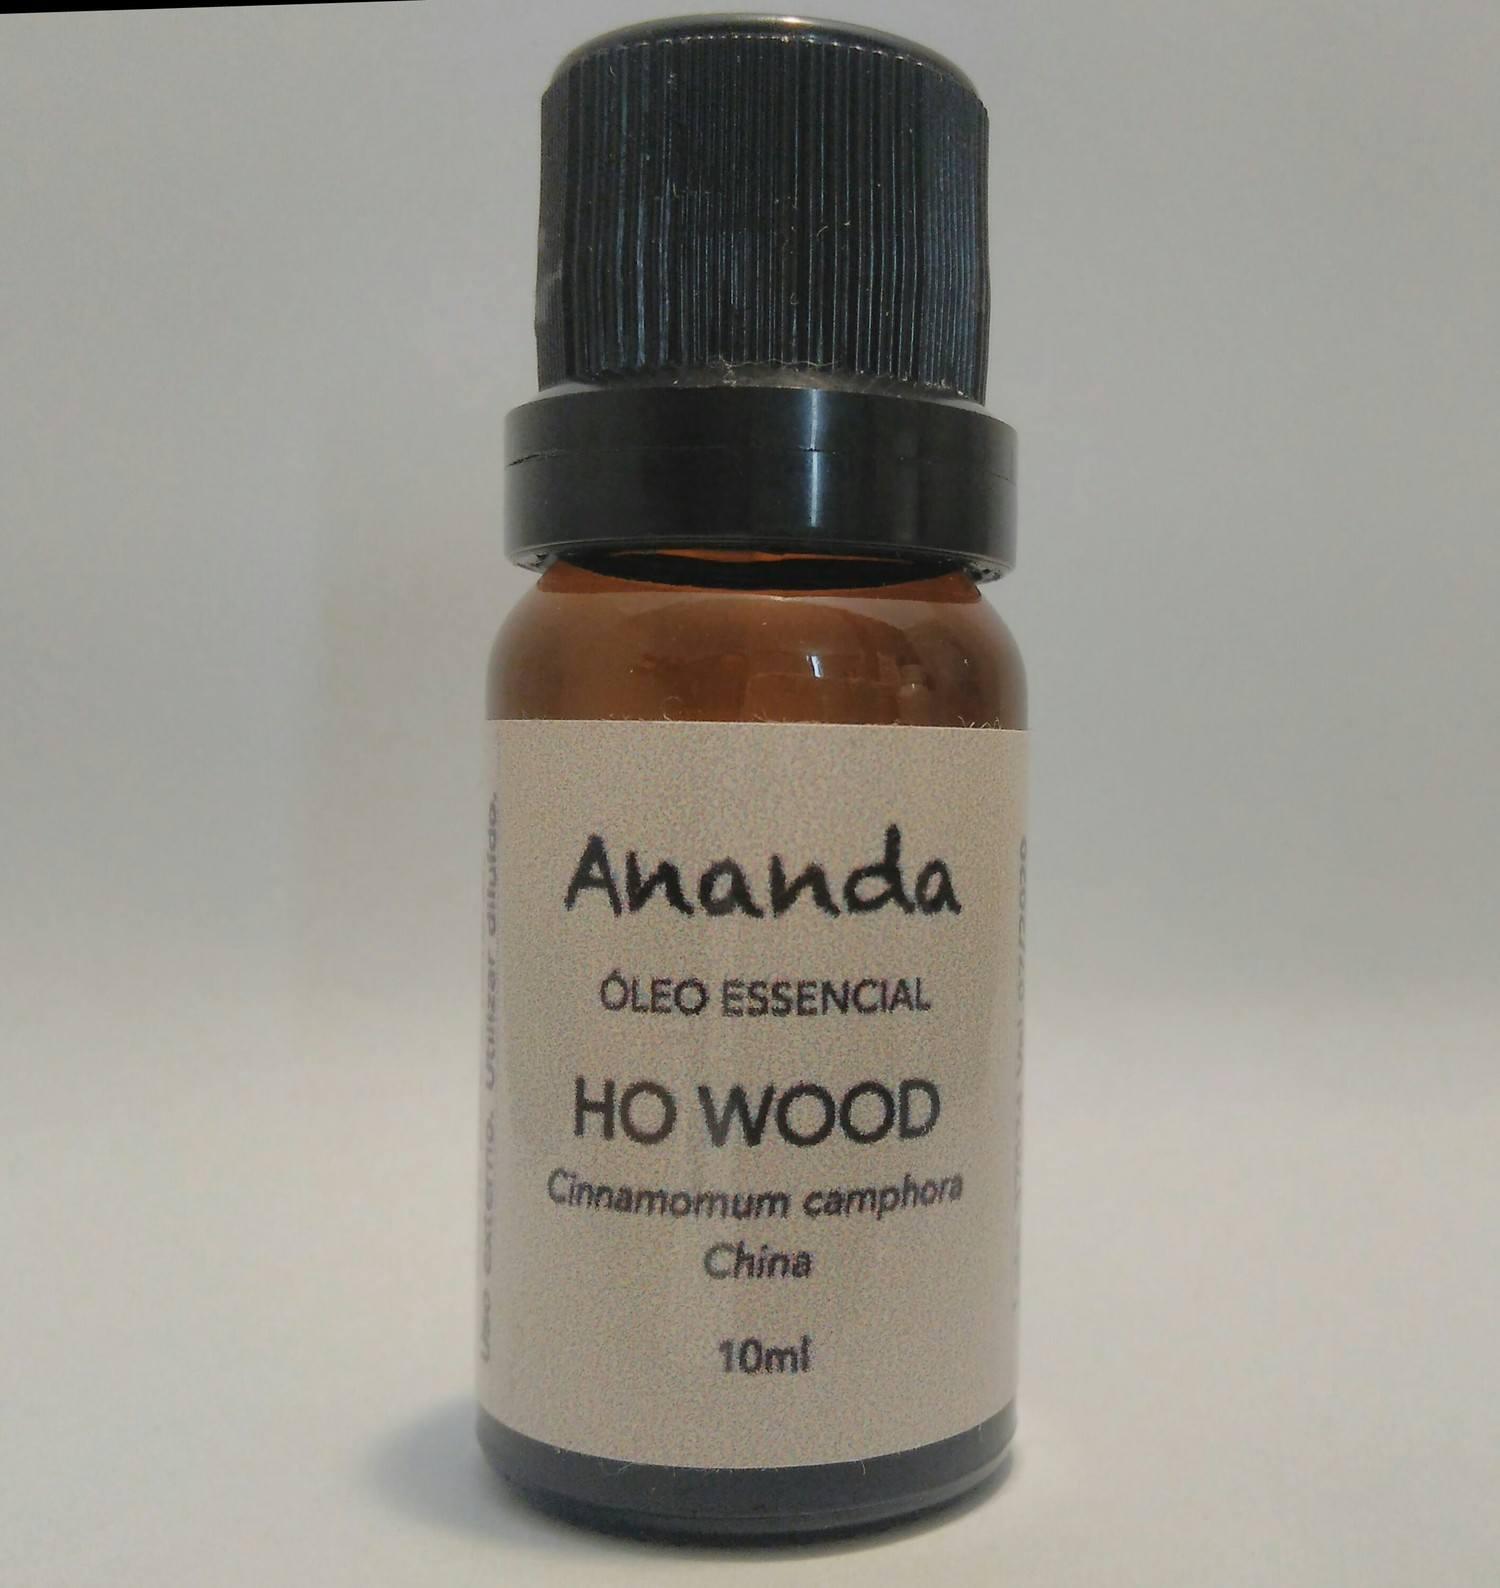 Óleo essencial de Ho Wood 10ml